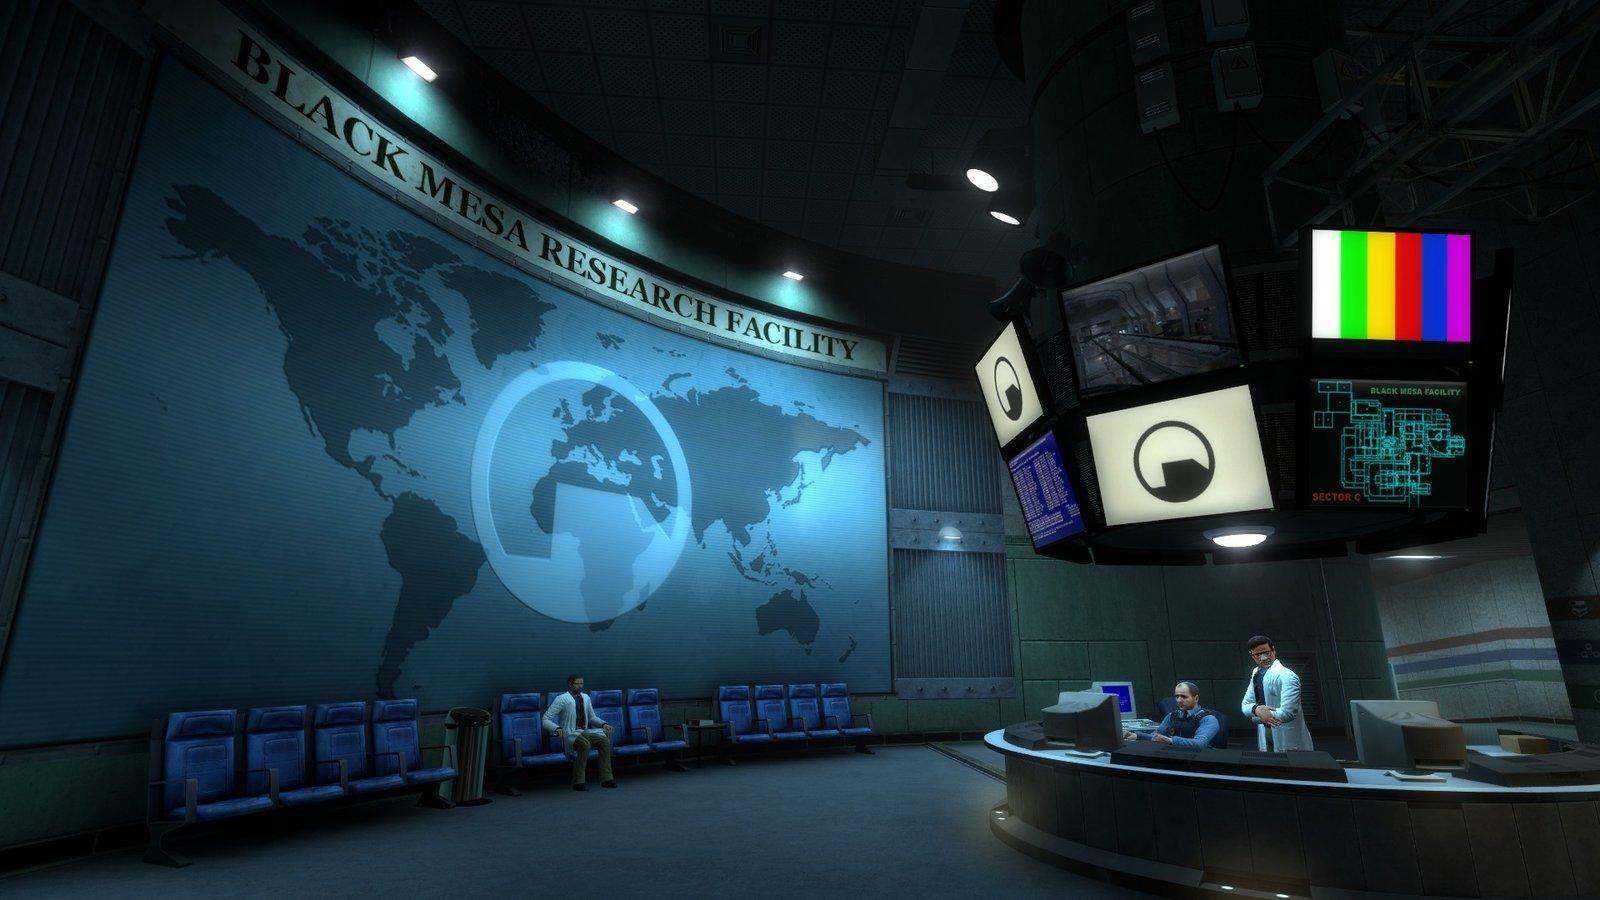 Black Mesa image 1